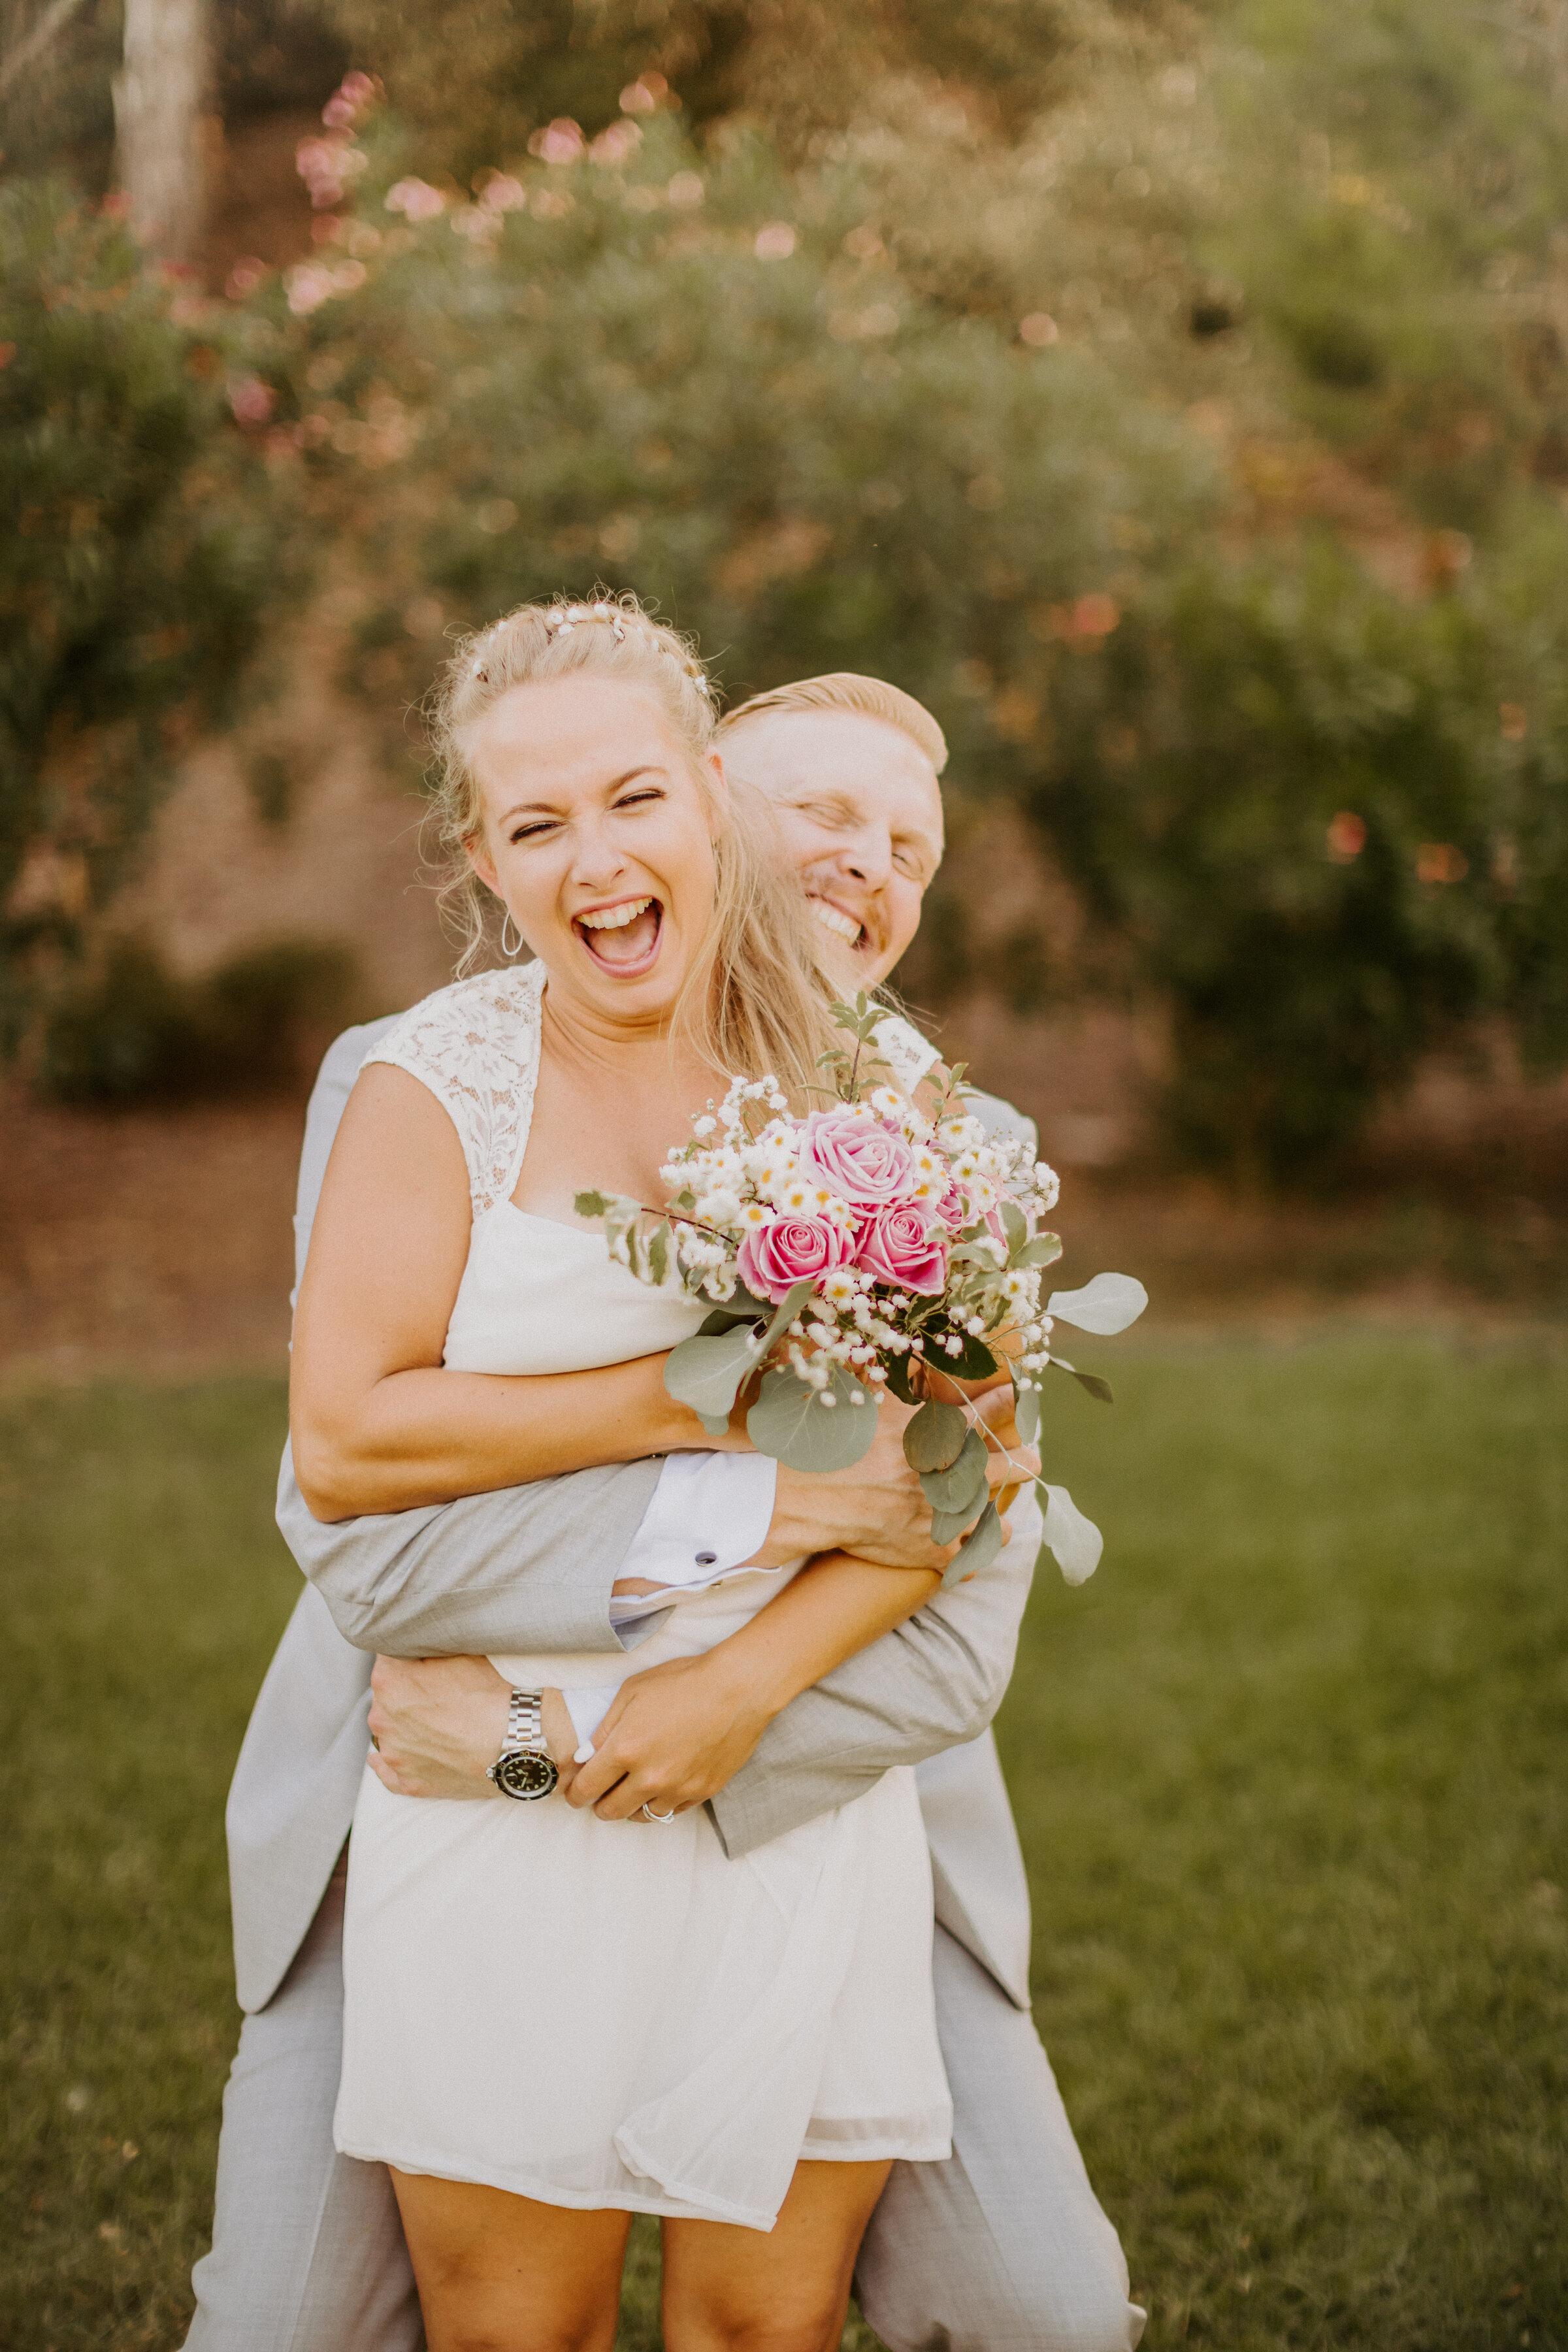 amphoto kj vowel renewal bridals-196.jpg